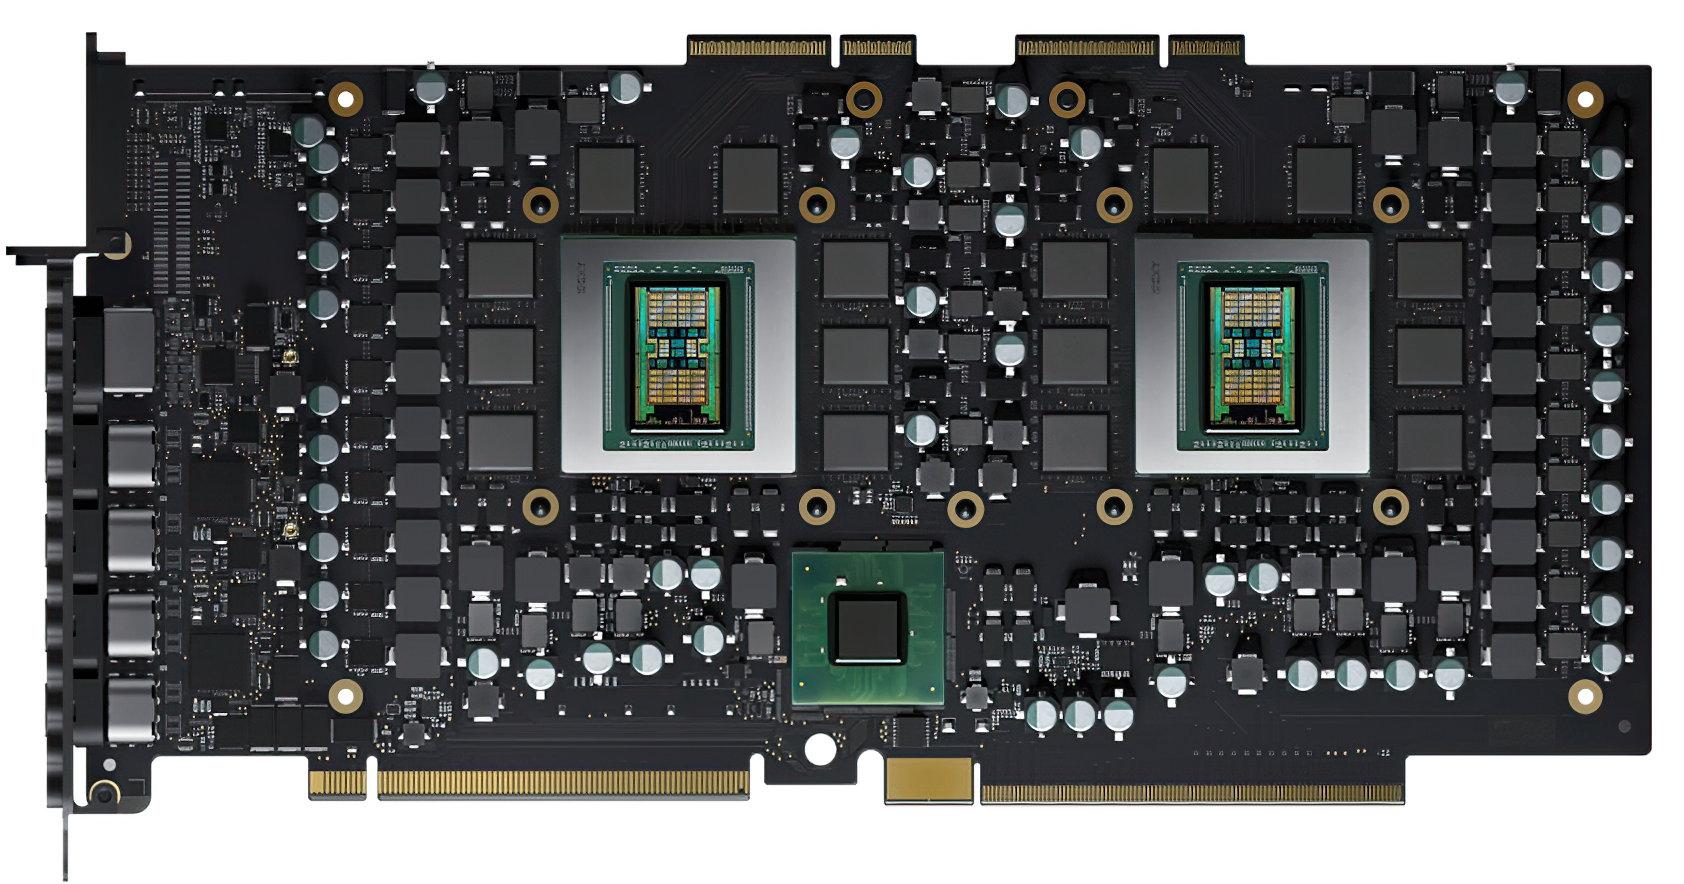 AMD-Radeon-Pro-W6800X-DUO-1.jpg